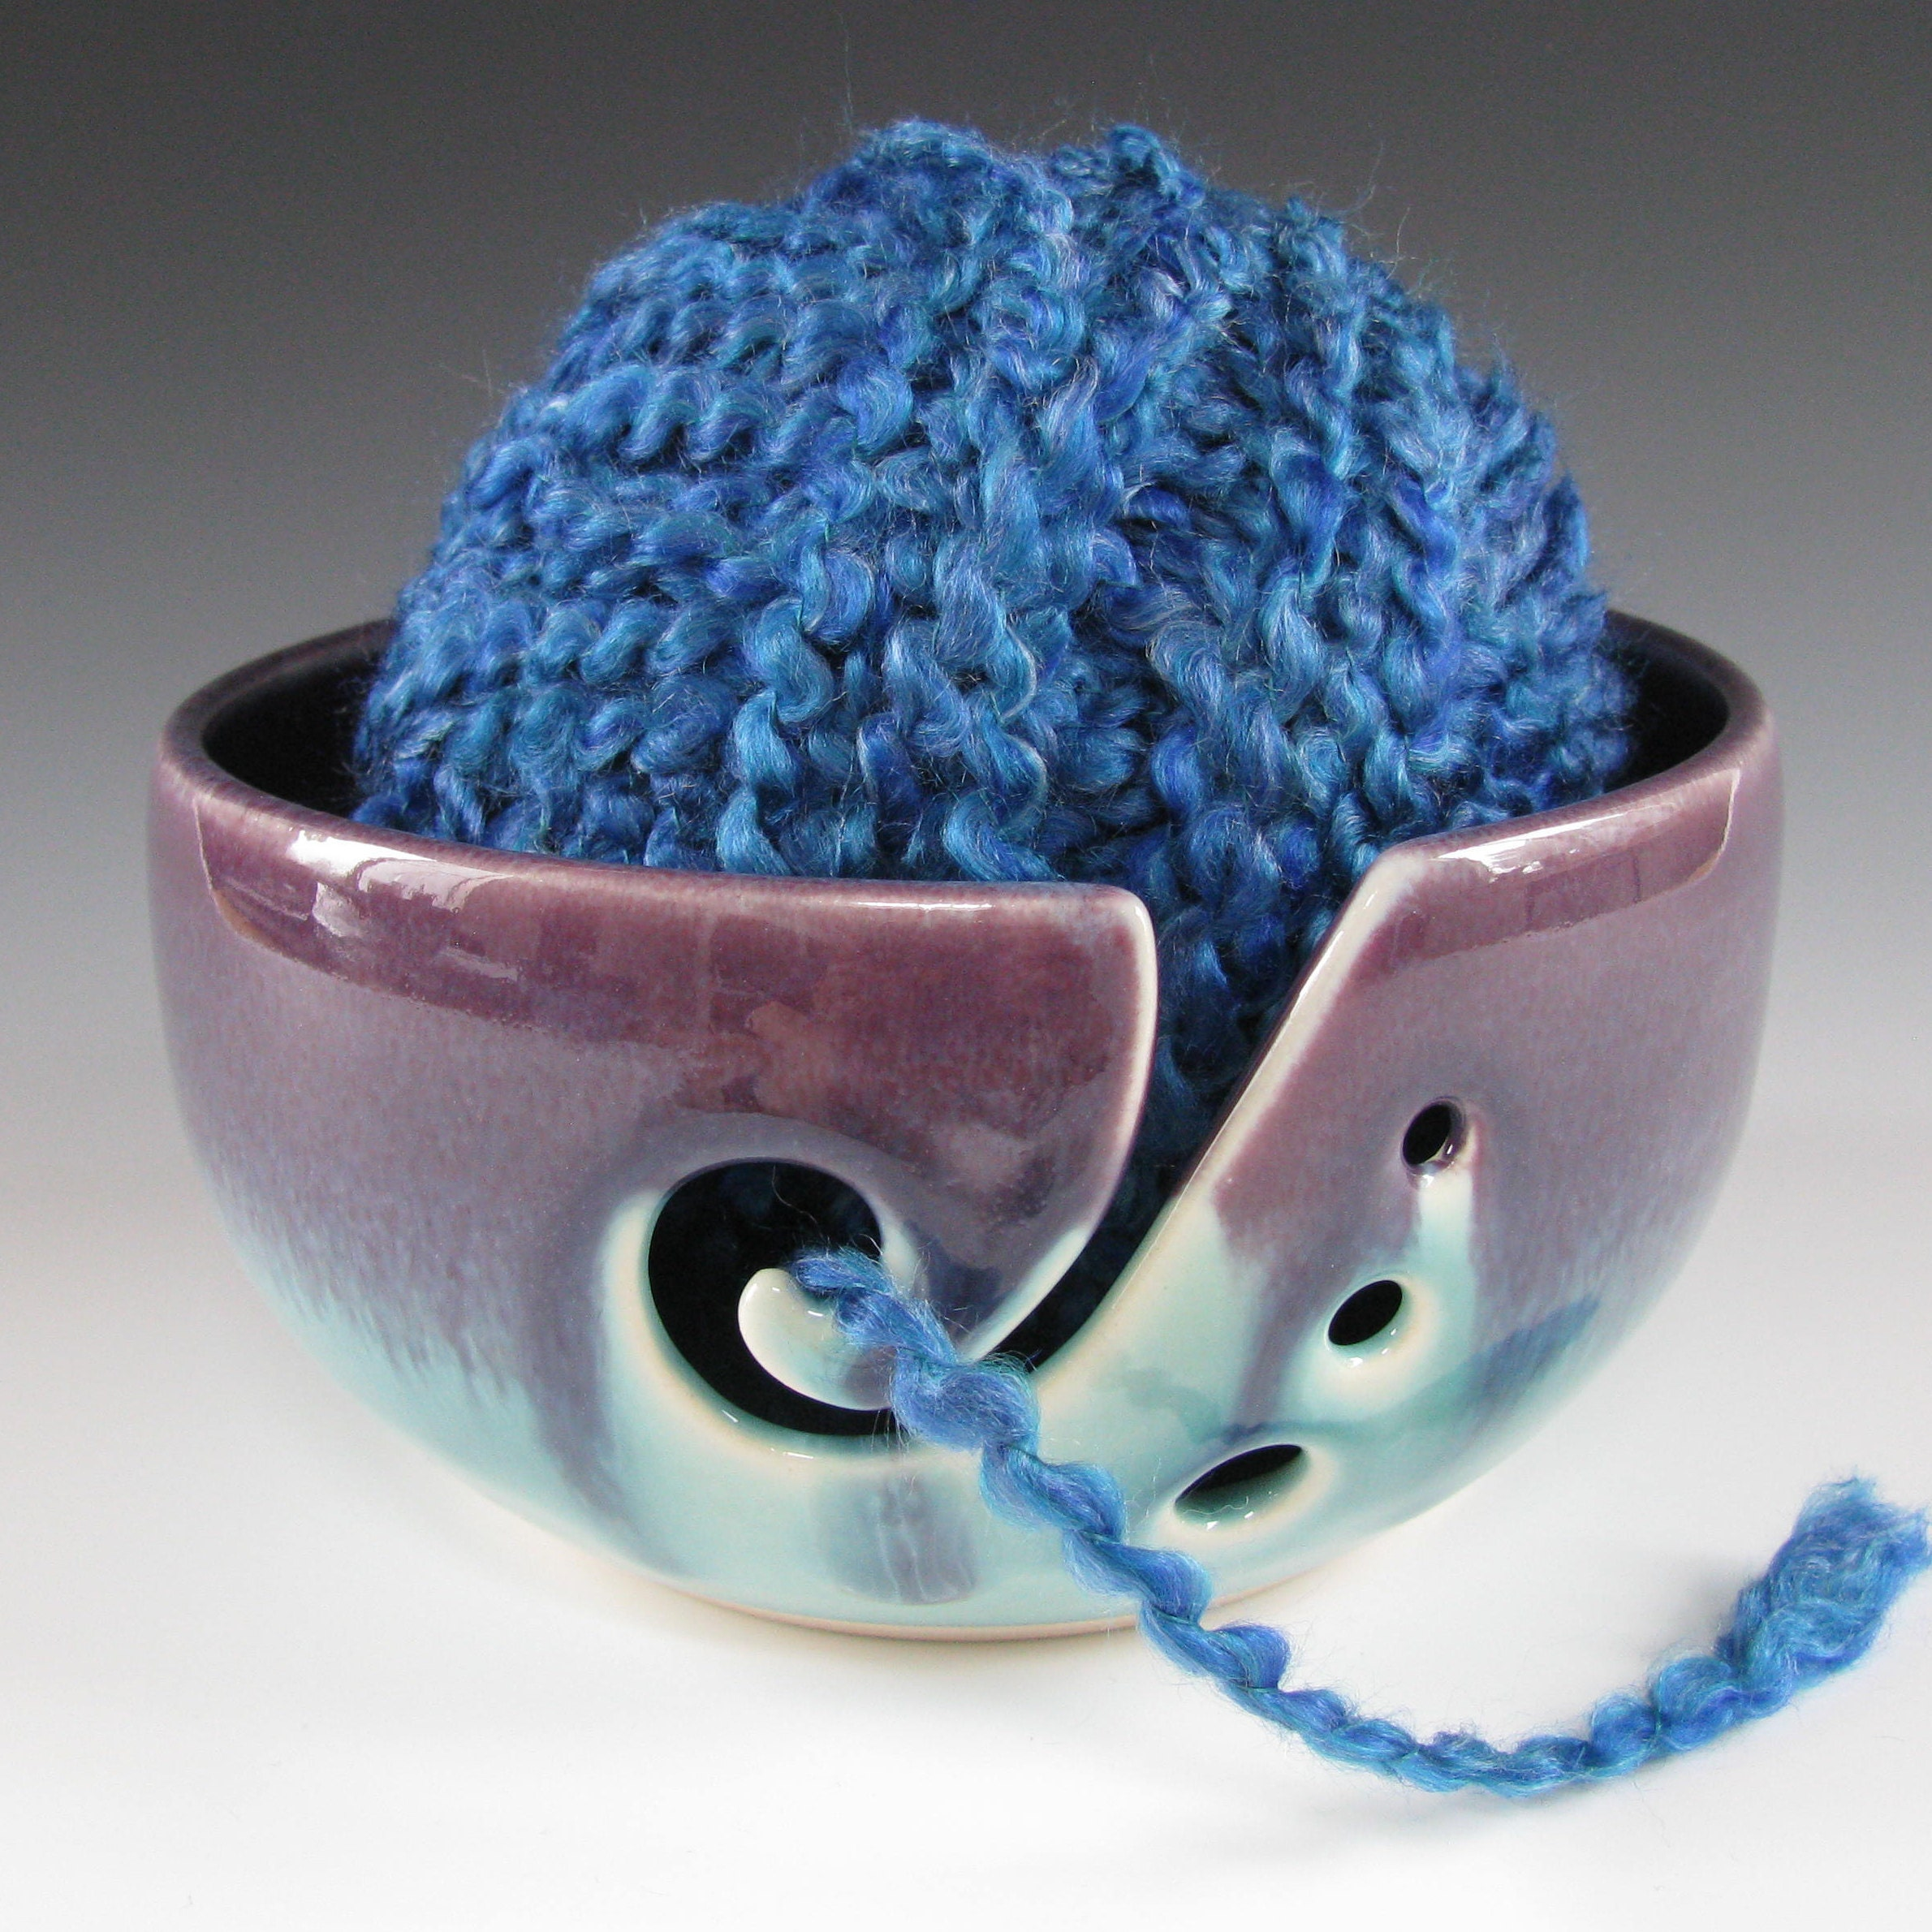 CeramicsbyMarcelle